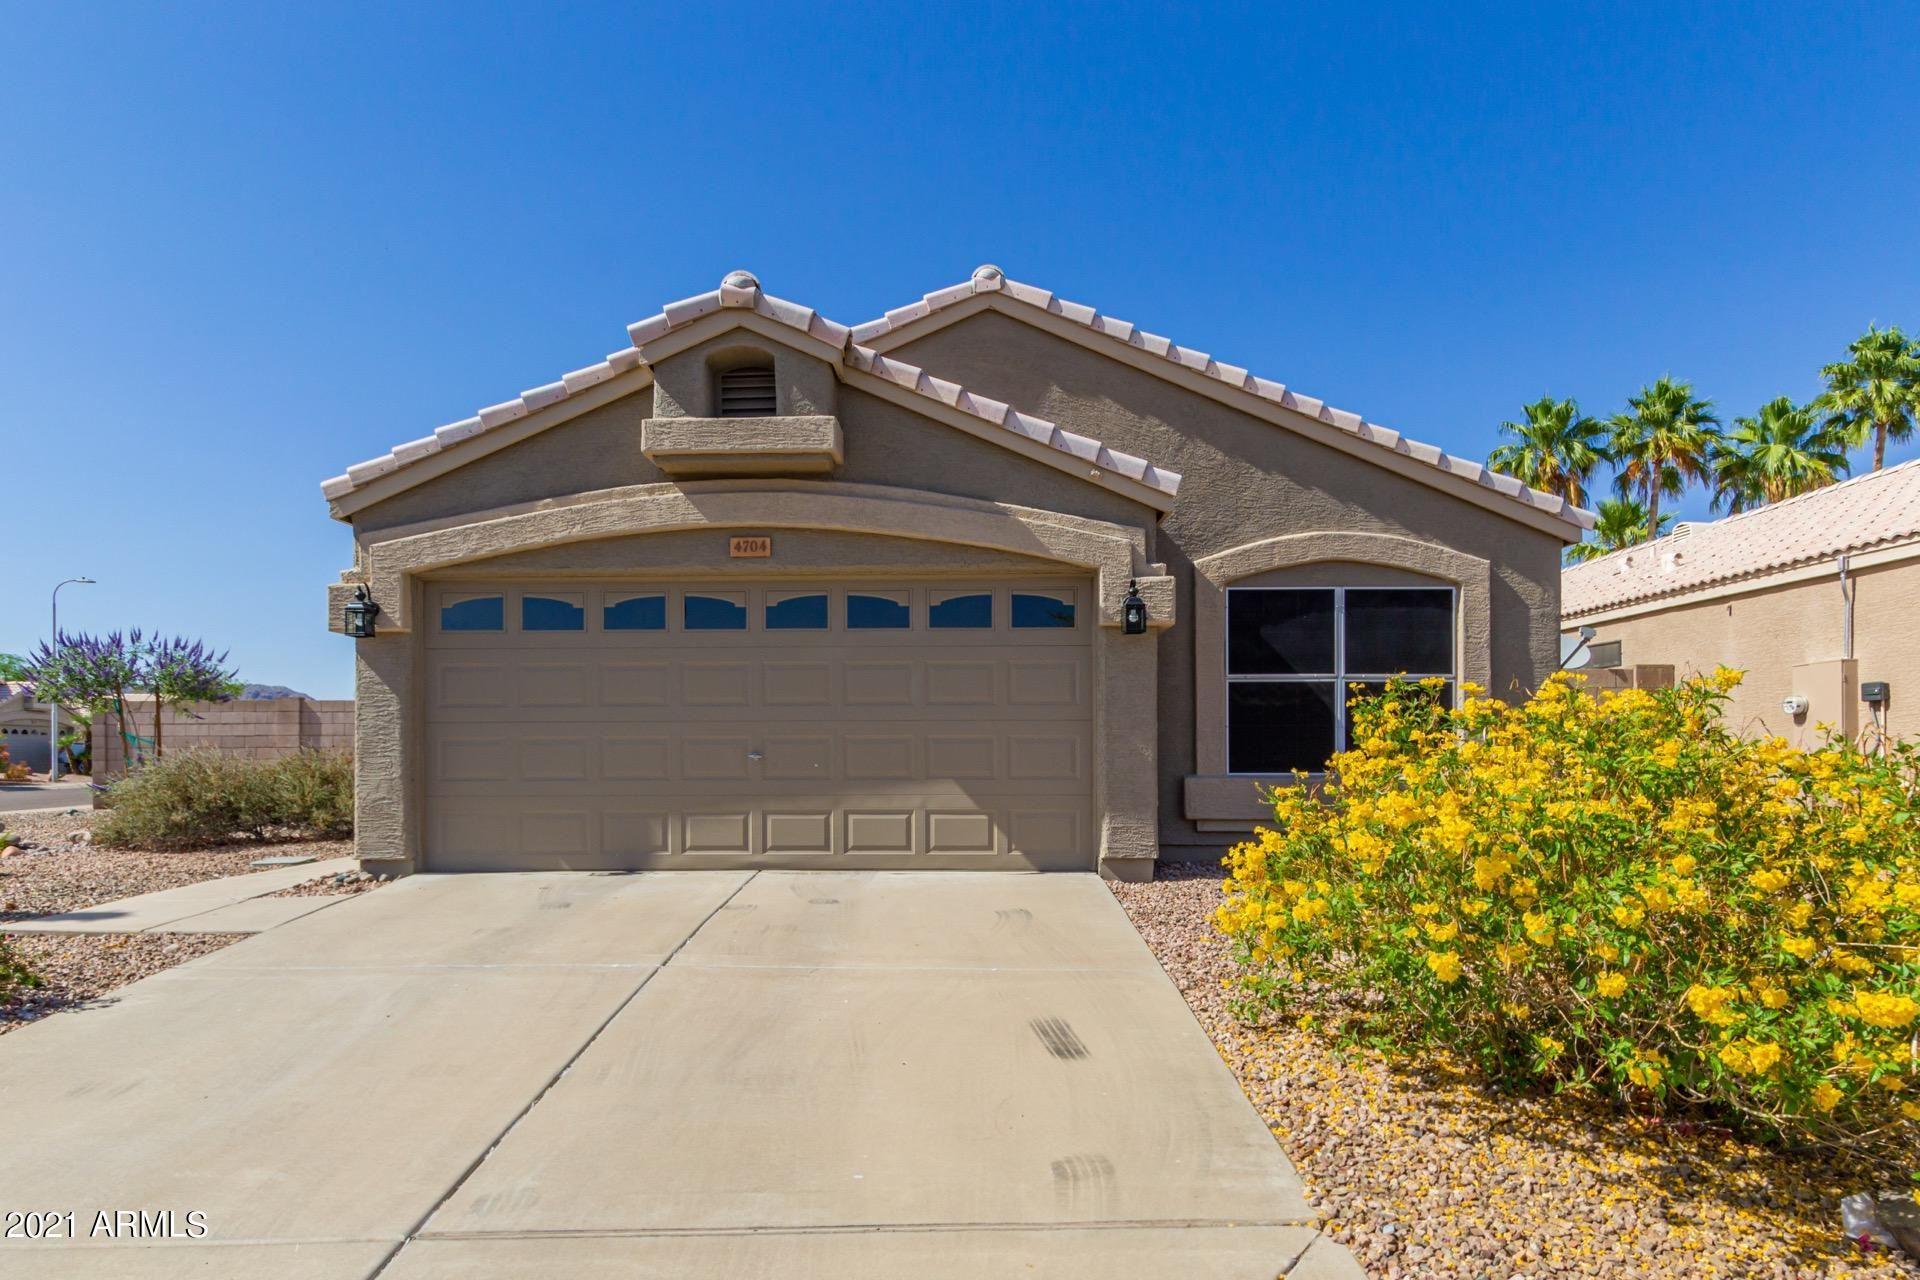 4704 E DESERT WIND Drive, Phoenix, AZ 85044 - MLS#: 6234530